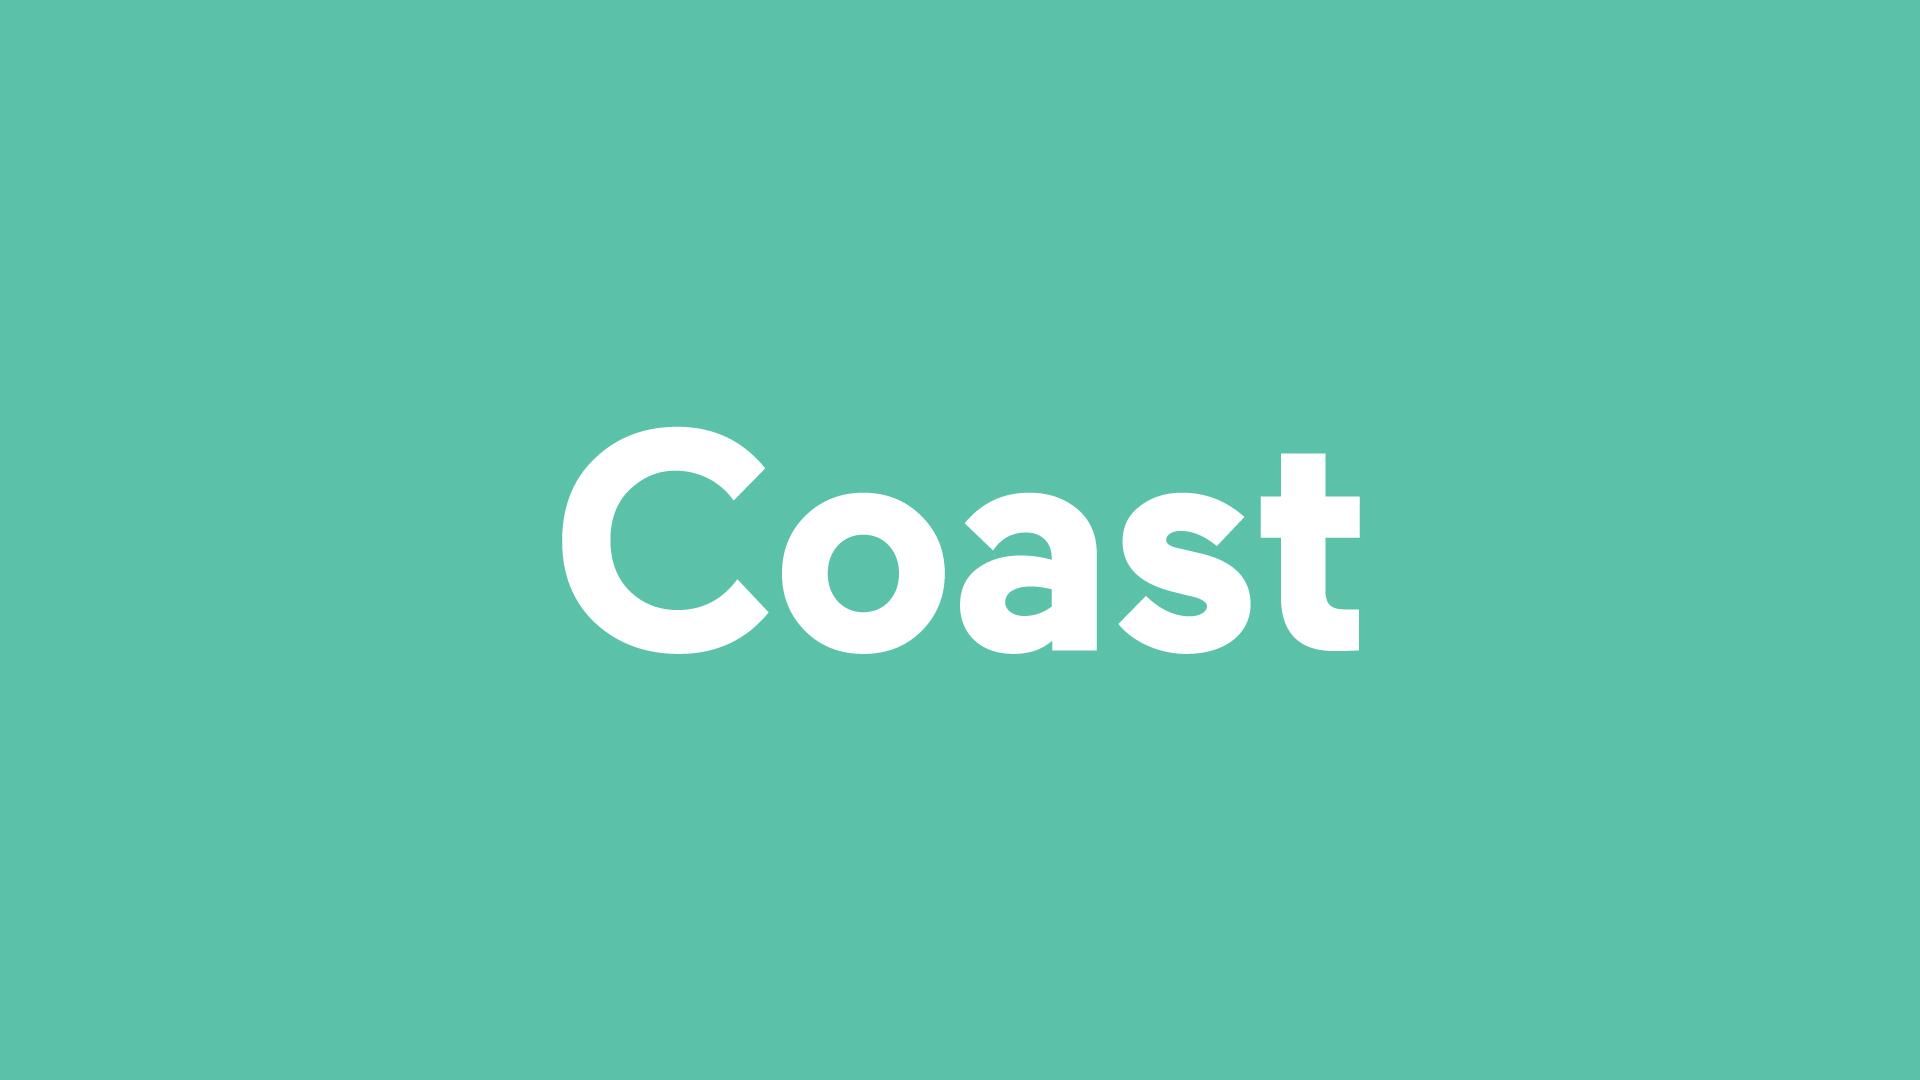 coasthomepage